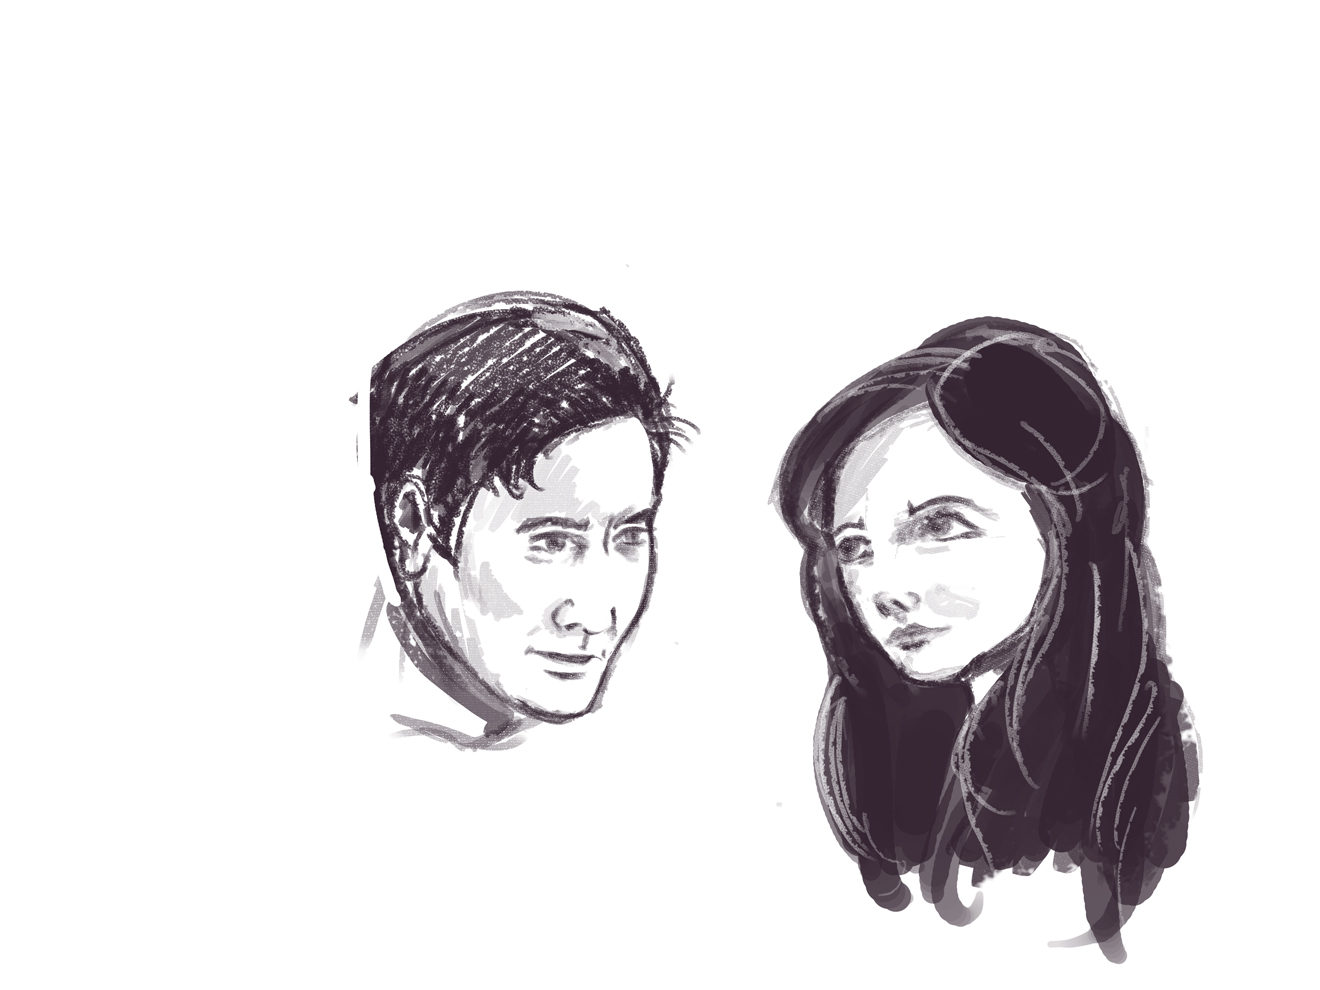 Sketchbook 2/22/16